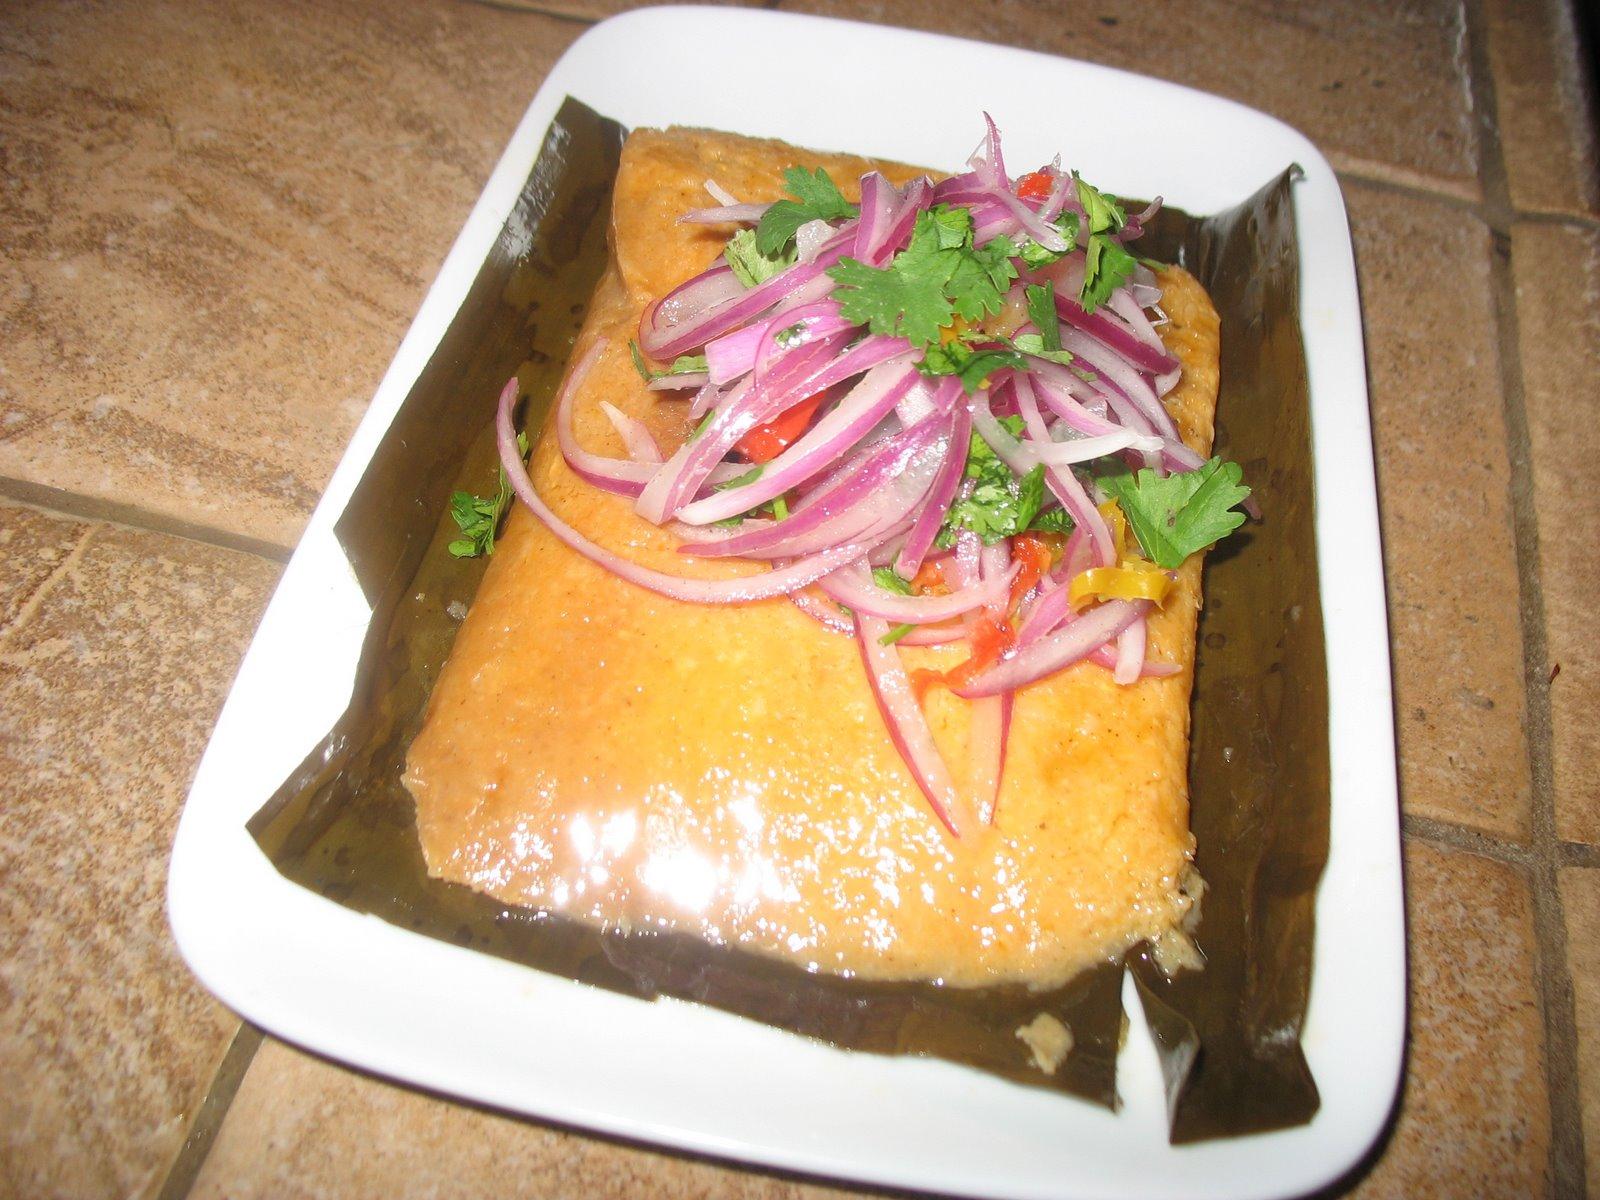 Tamal Peruano